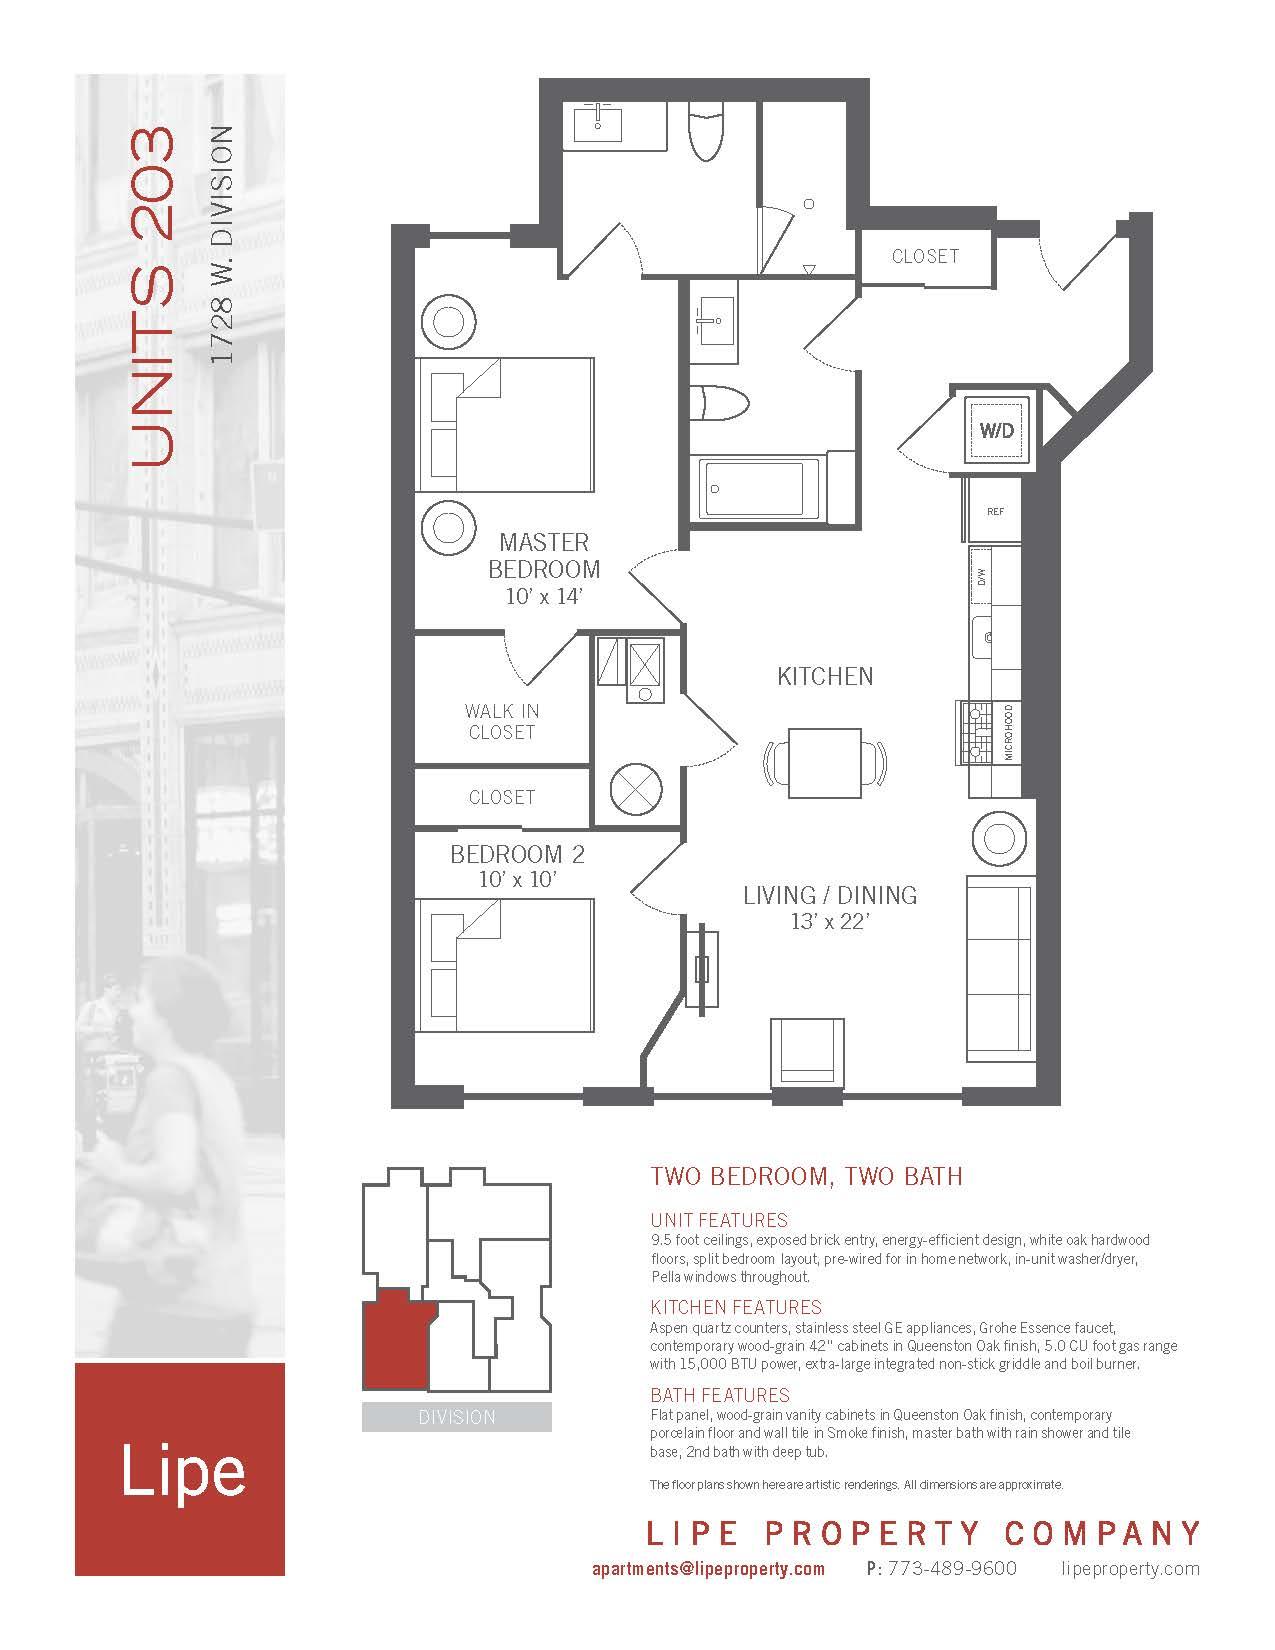 1728-West-Division-203-Floorplan-Chicago-apartment-for-rent.jpg